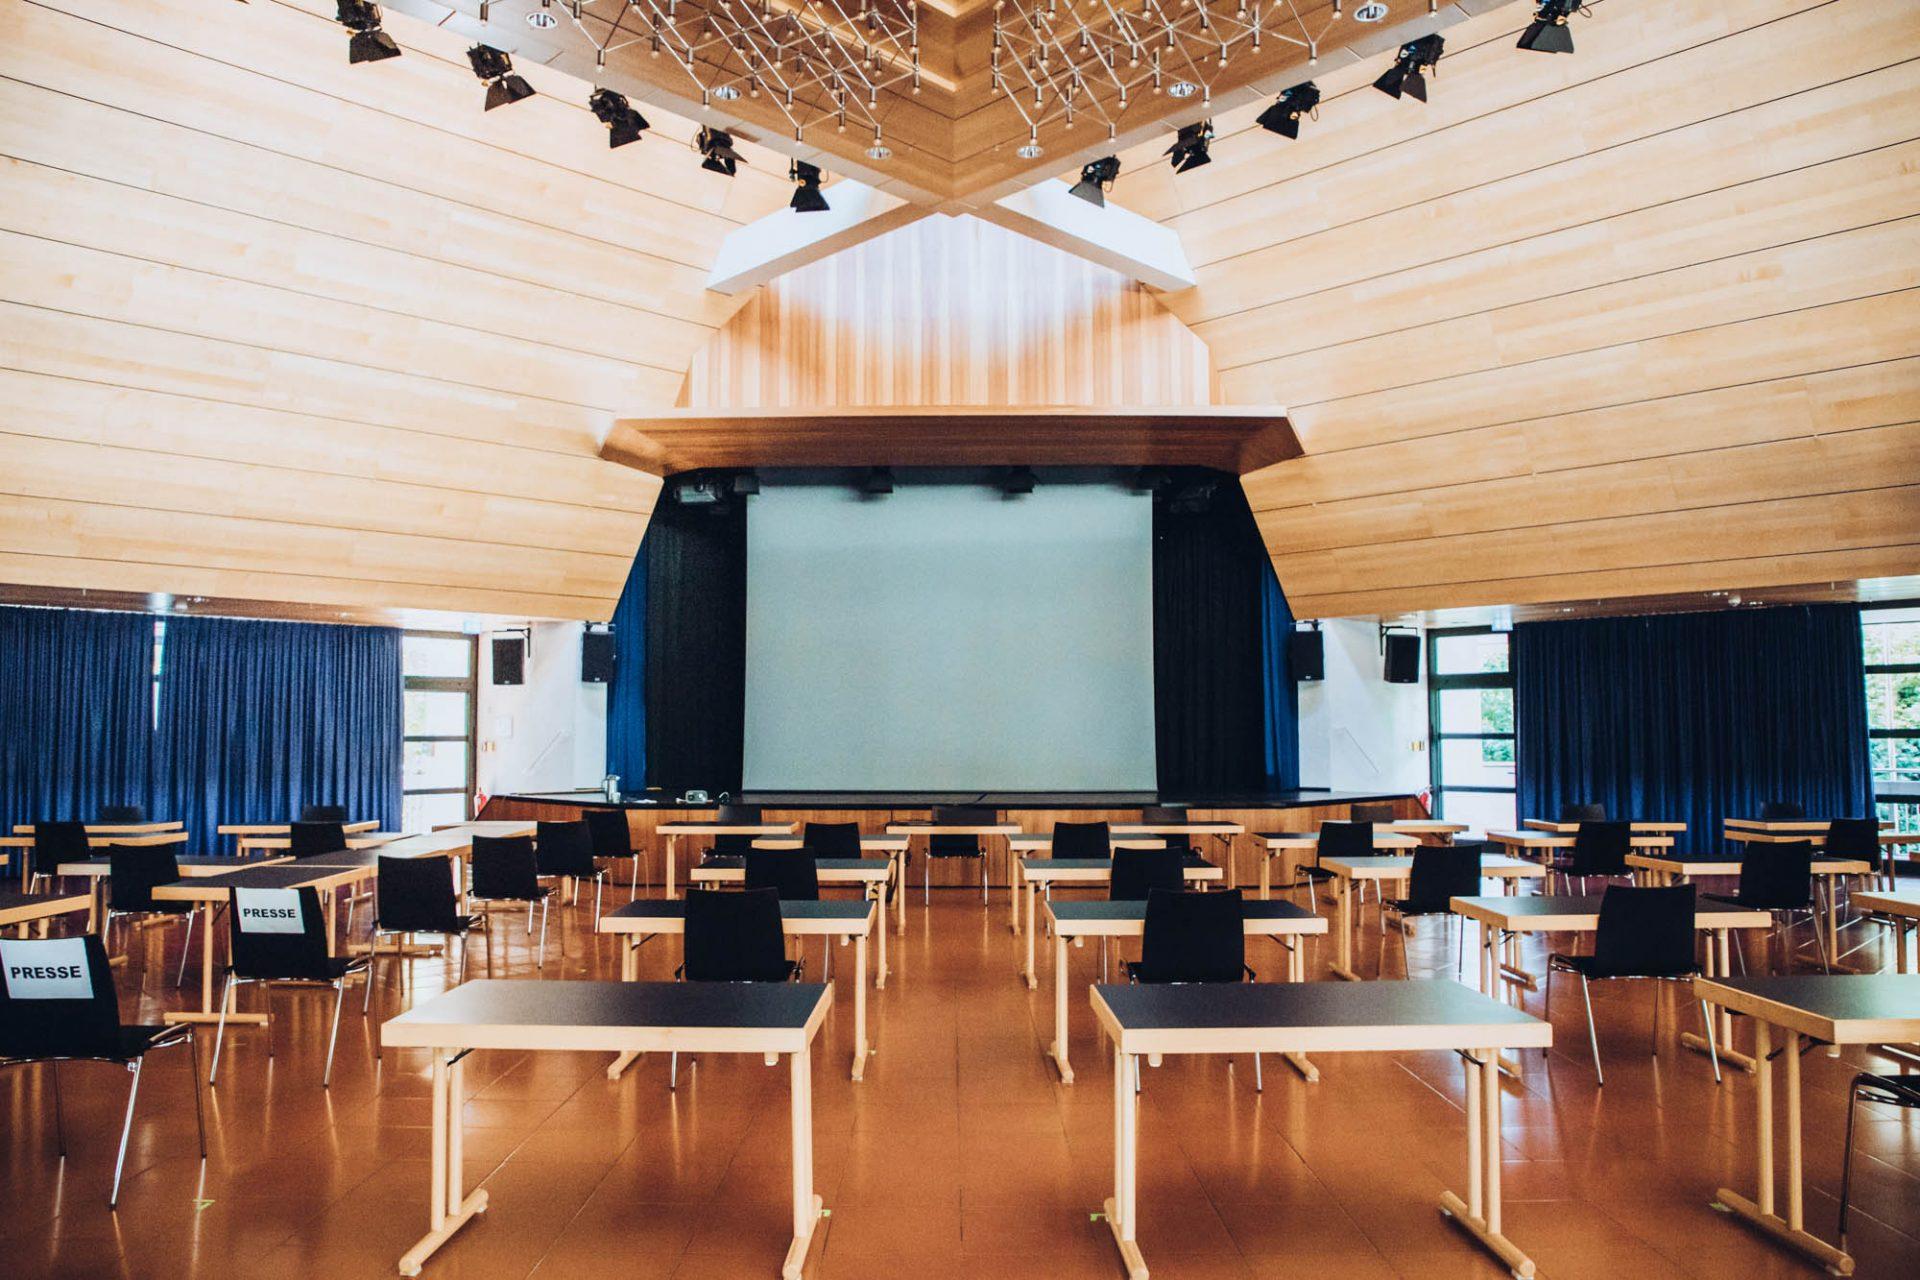 gavesi-eching-restaurant-062020-mokati-fotos-film-38